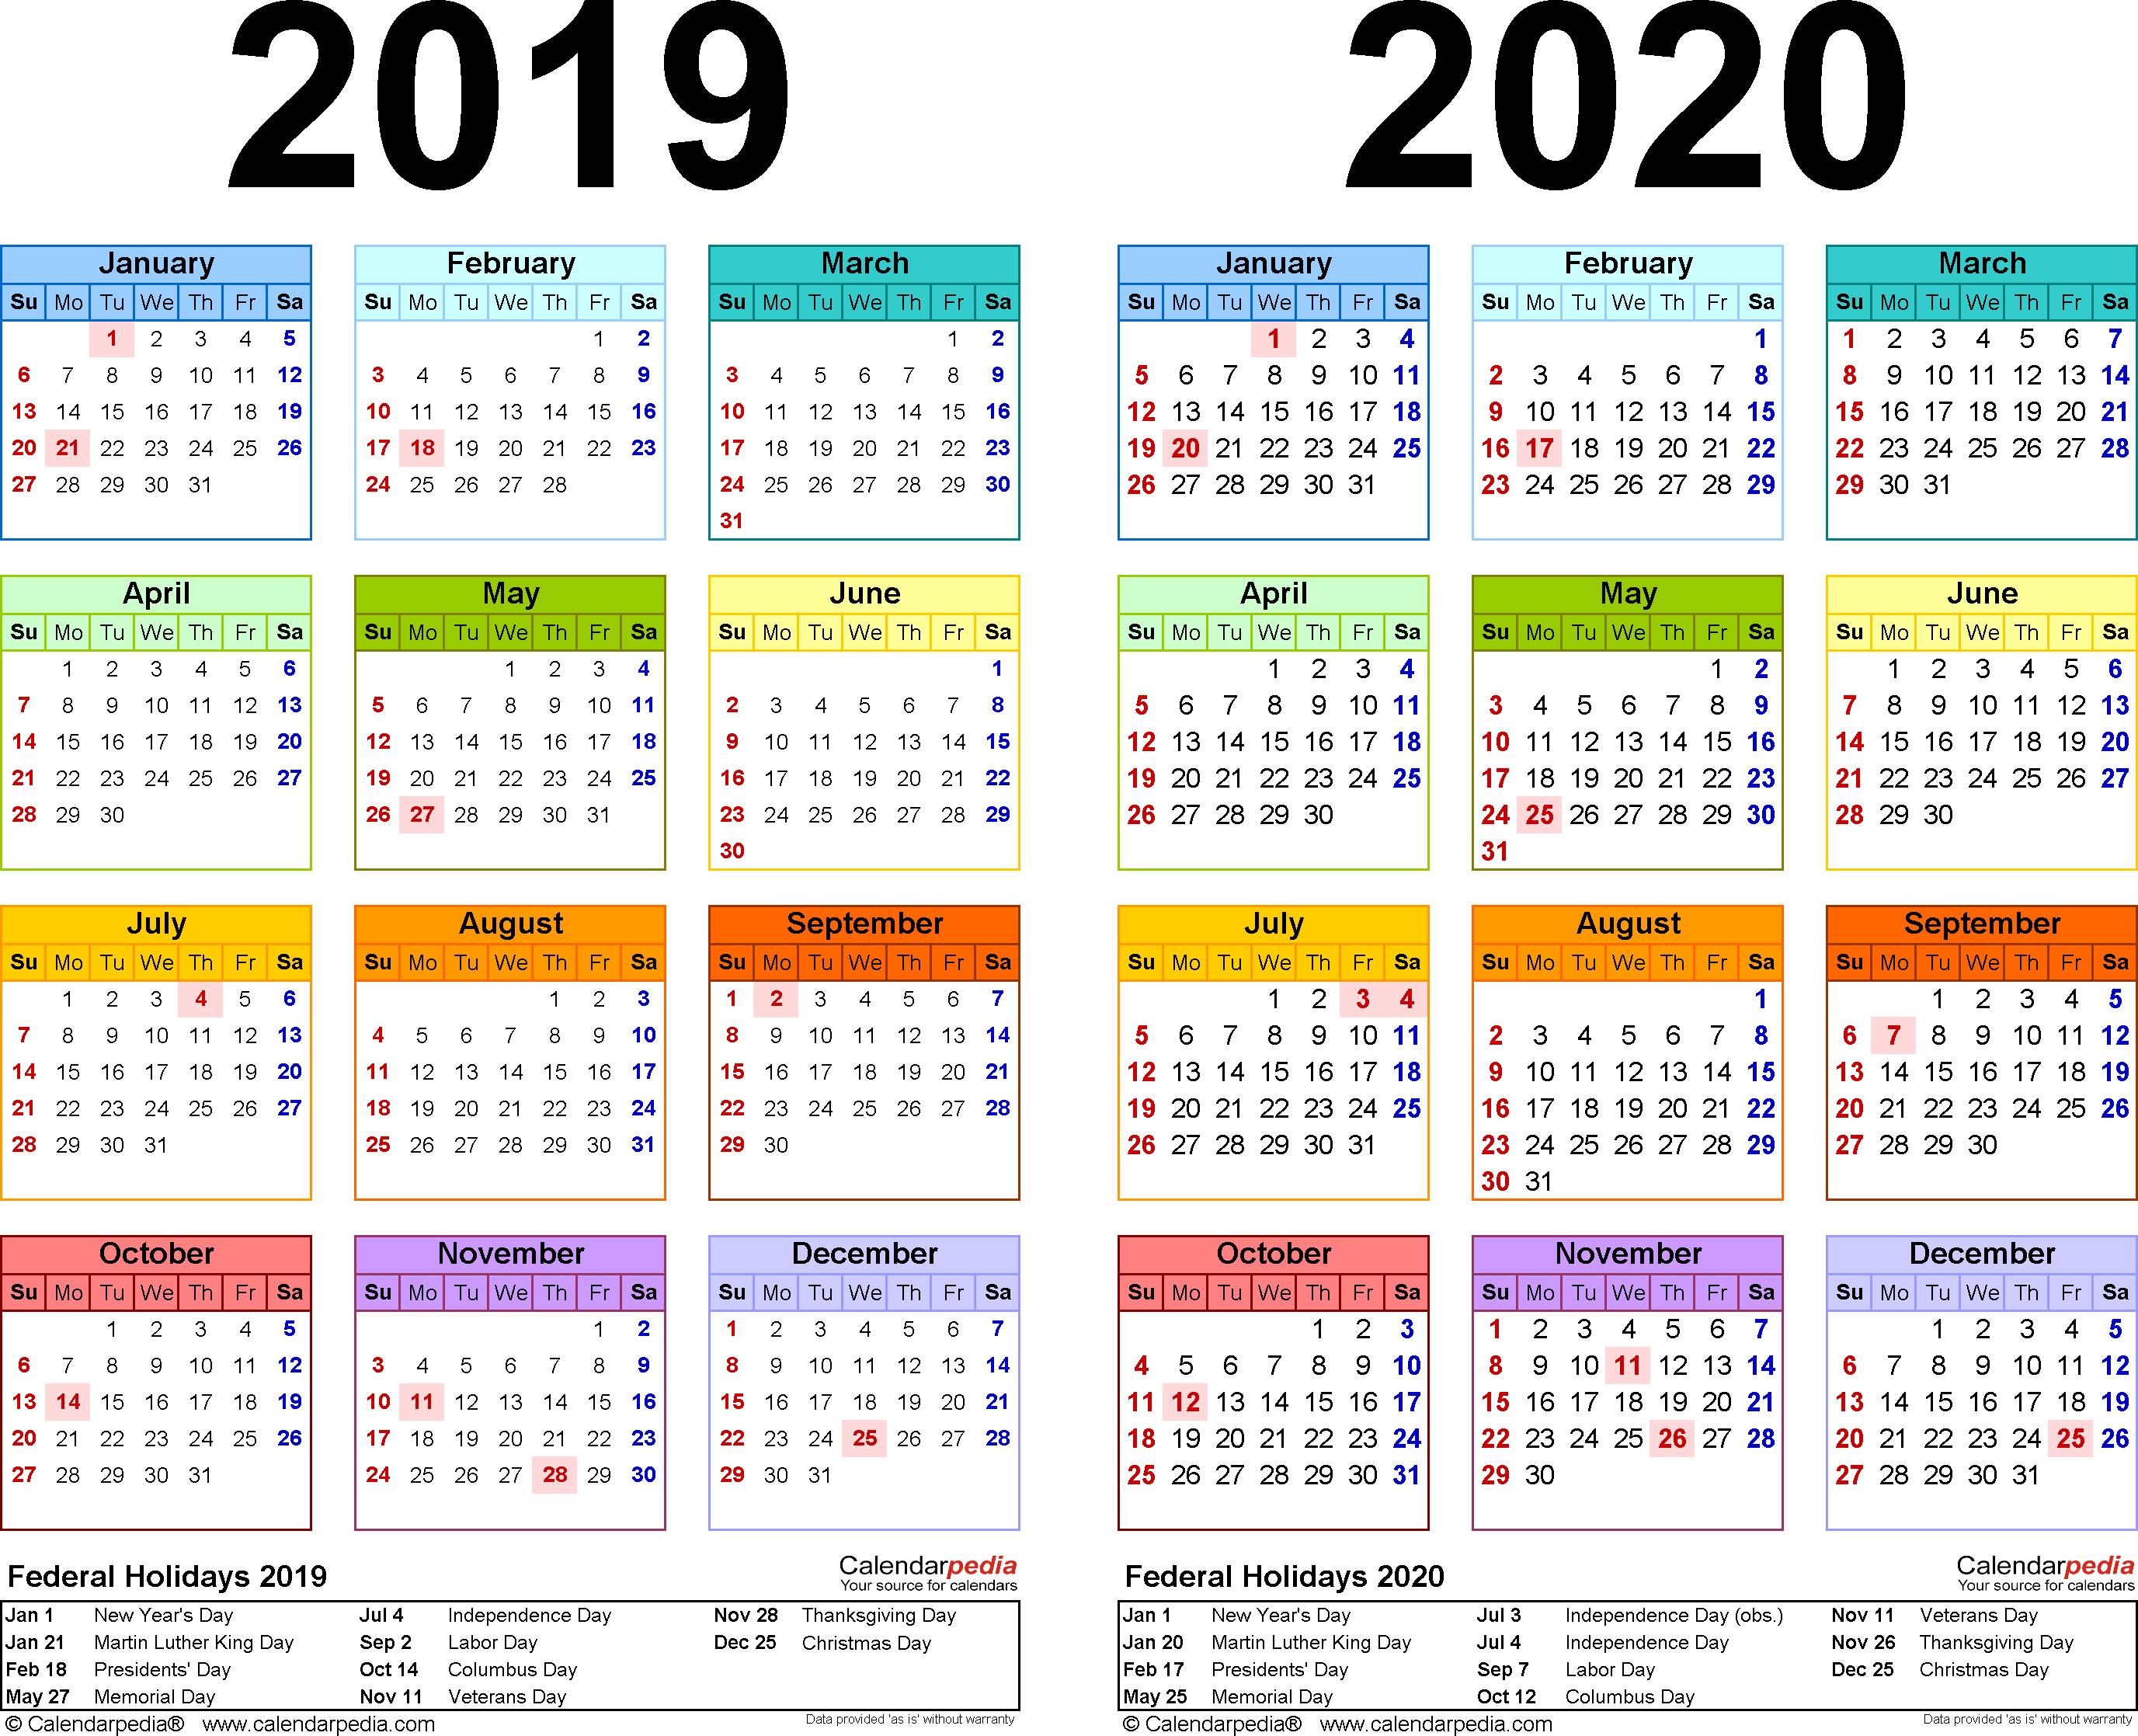 2019-2020 Calendar - Free Printable Two-Year Excel Calendars for Year Calendar 2019 2020 Editable